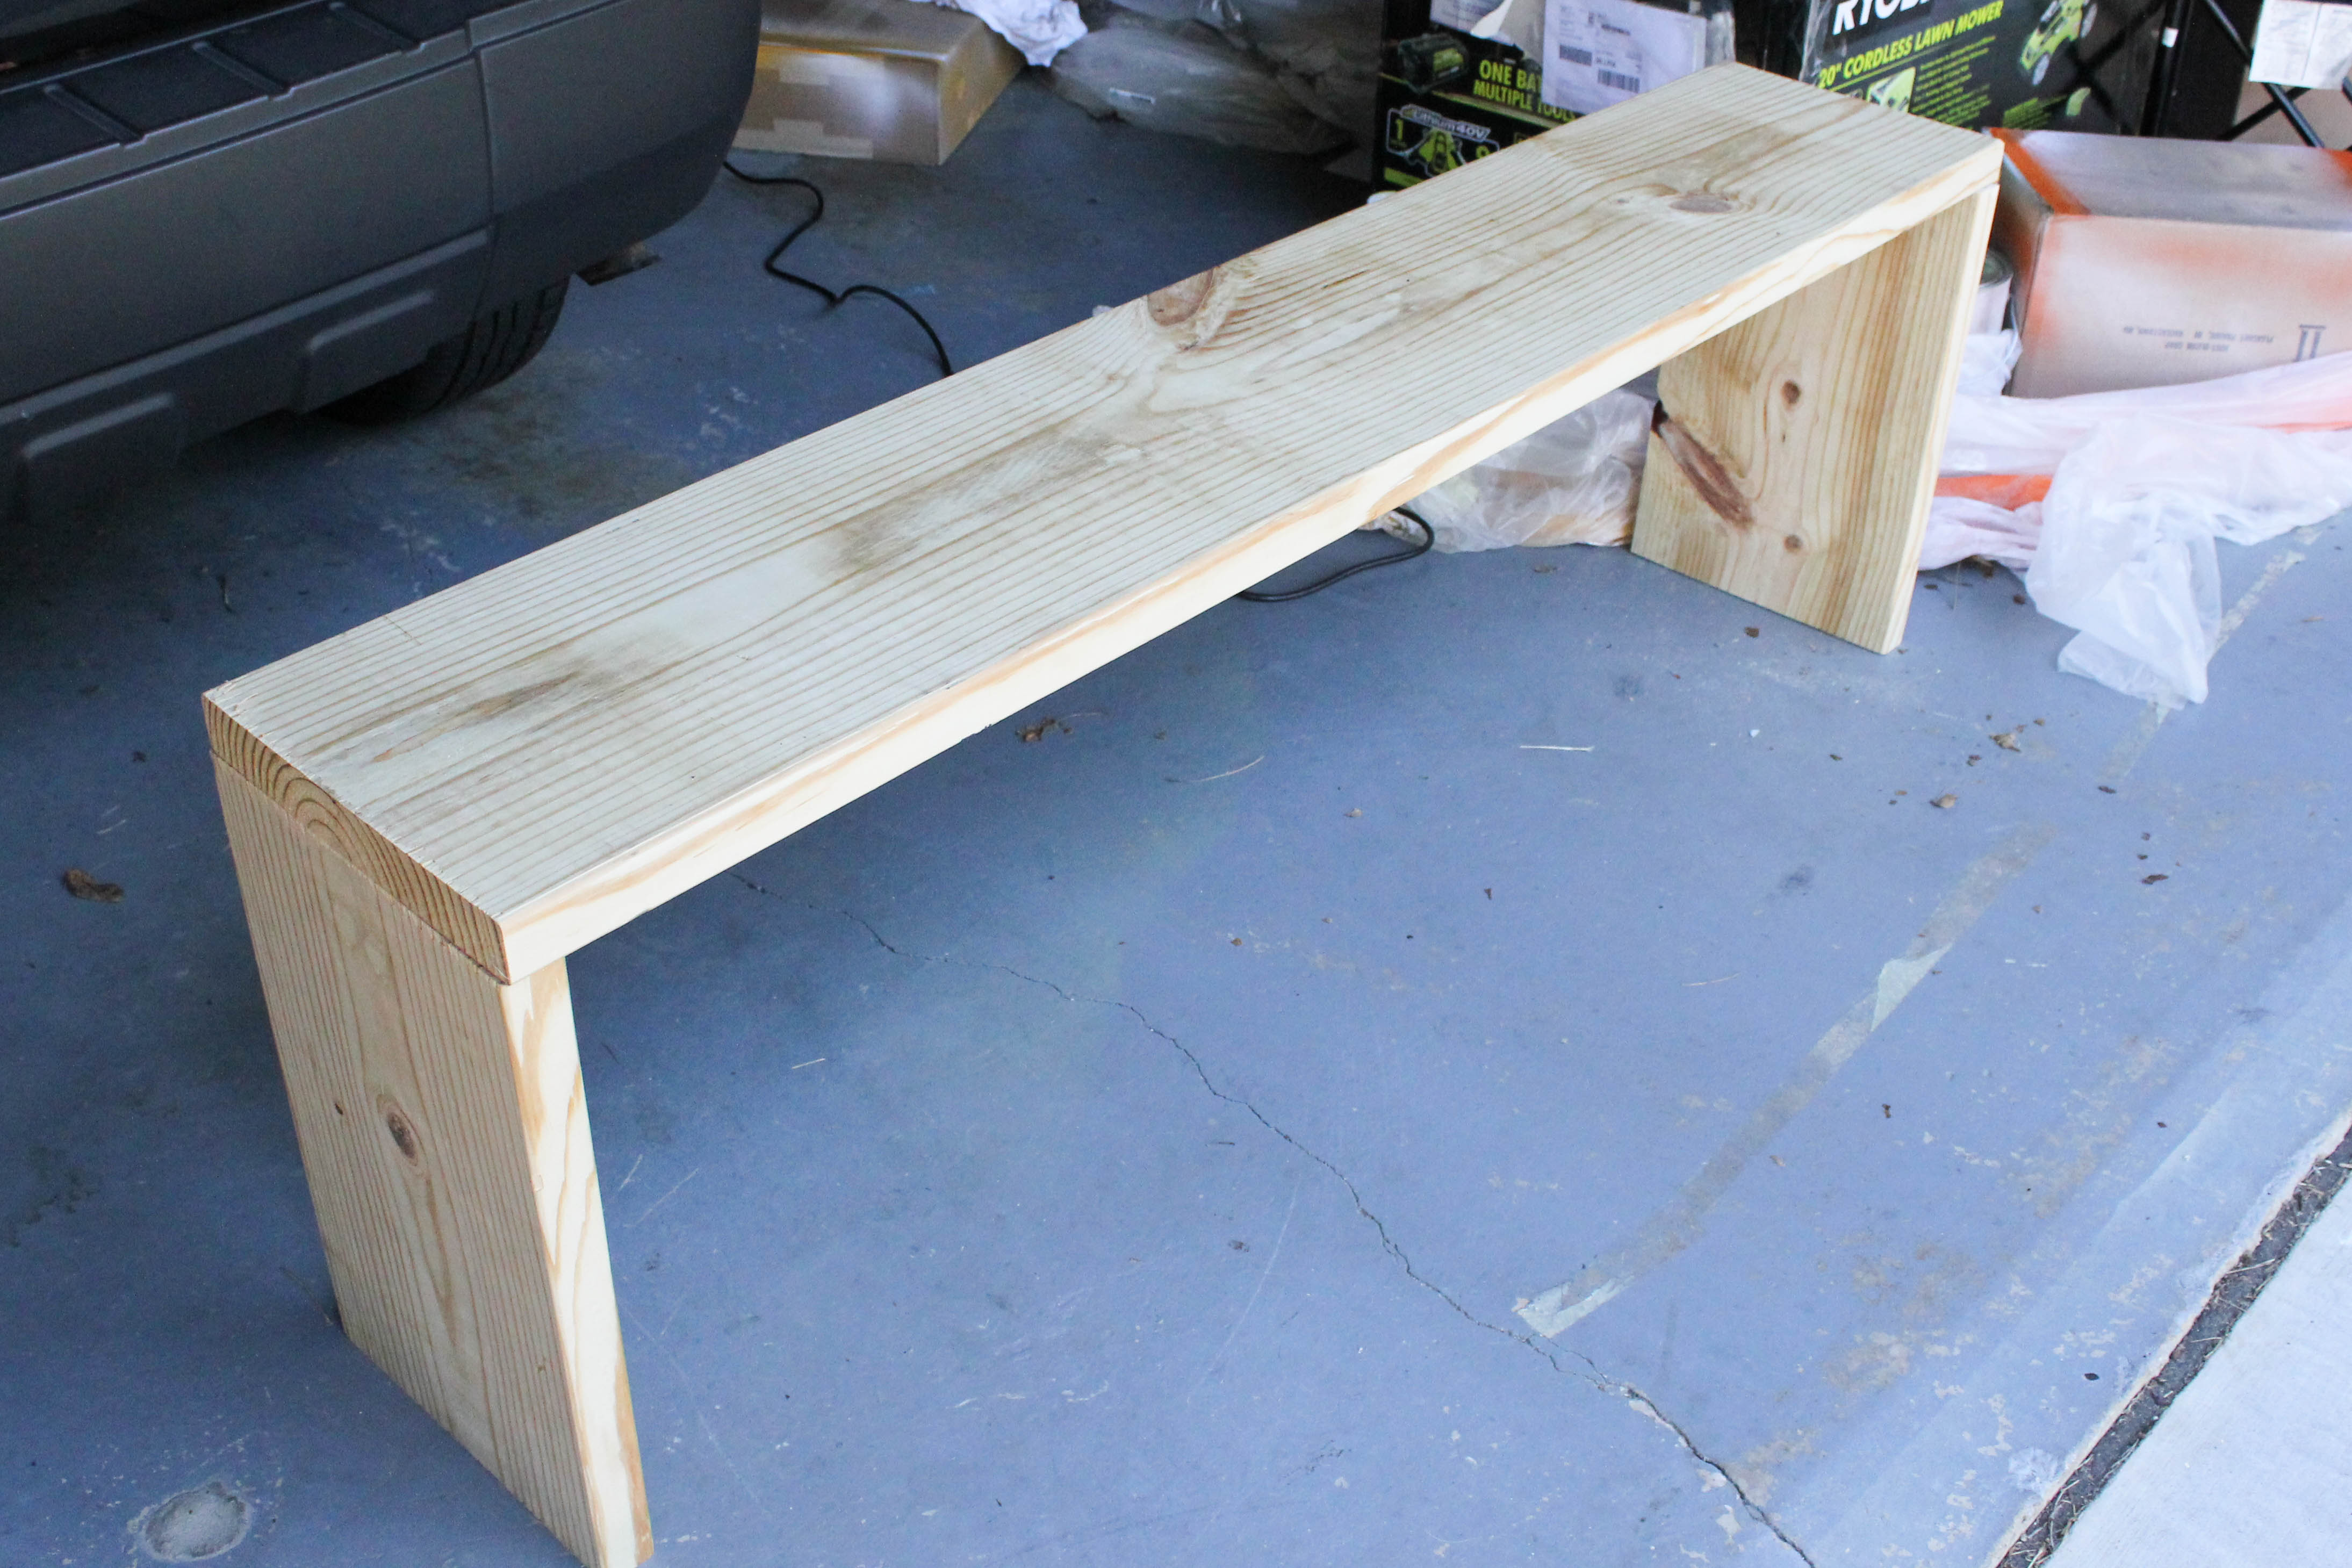 entryway bench plans & tutorial - erin spain